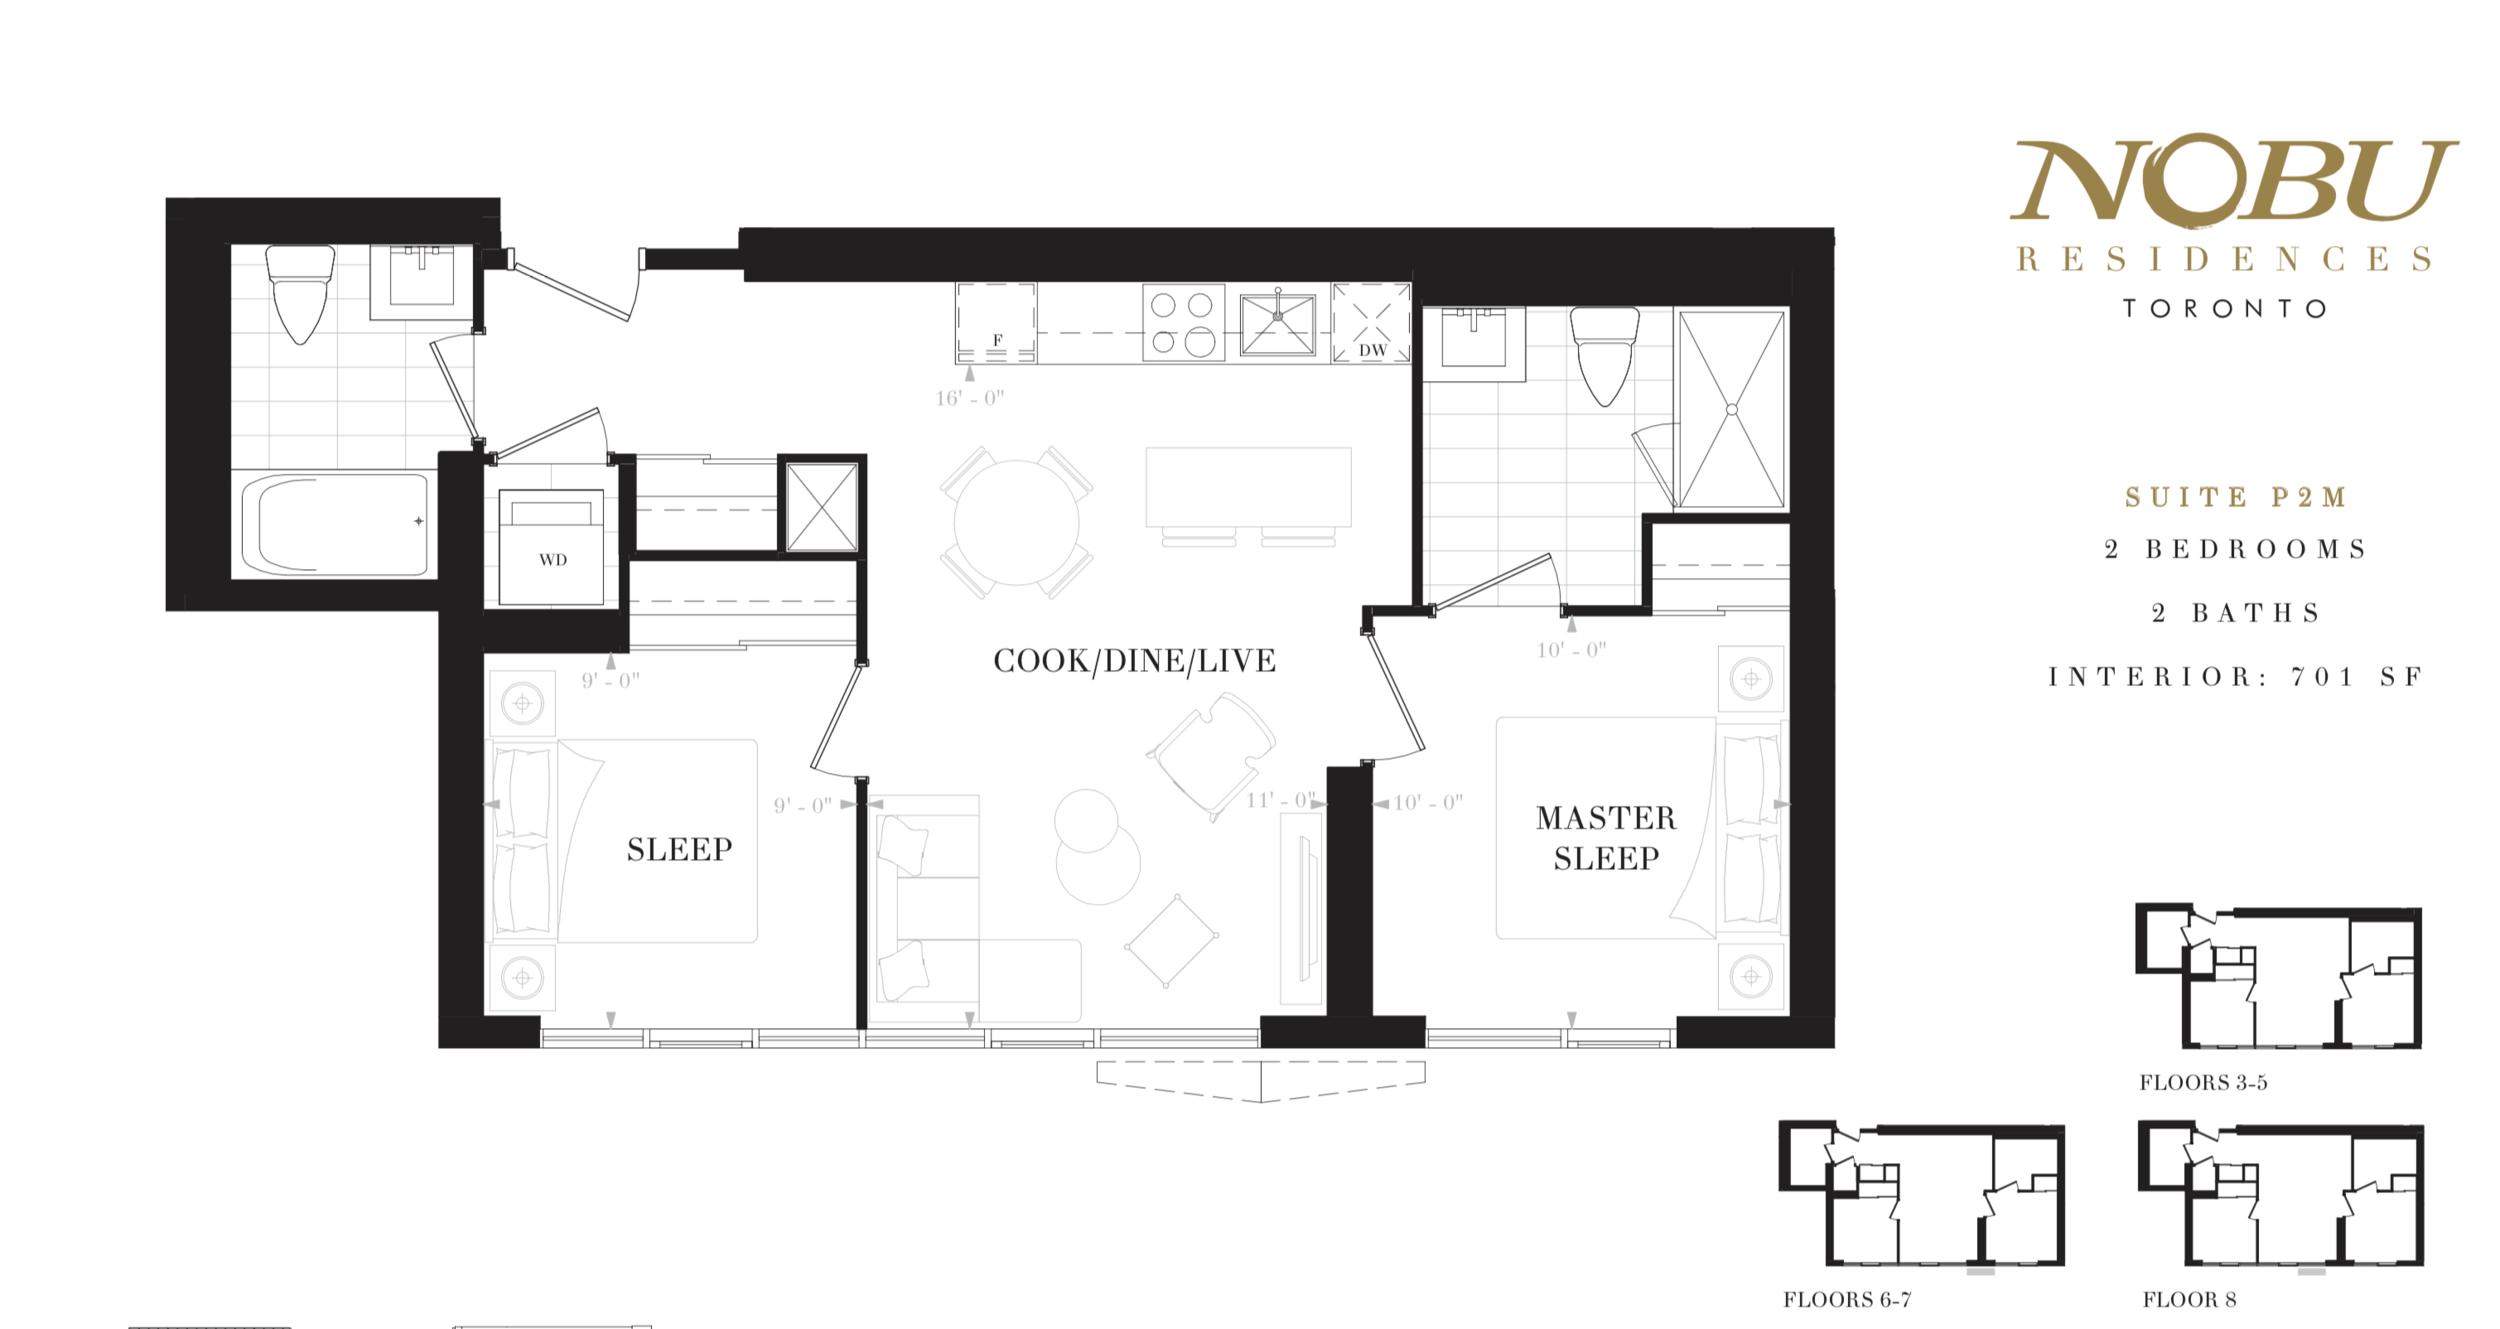 Nobu Residences Floor Plan